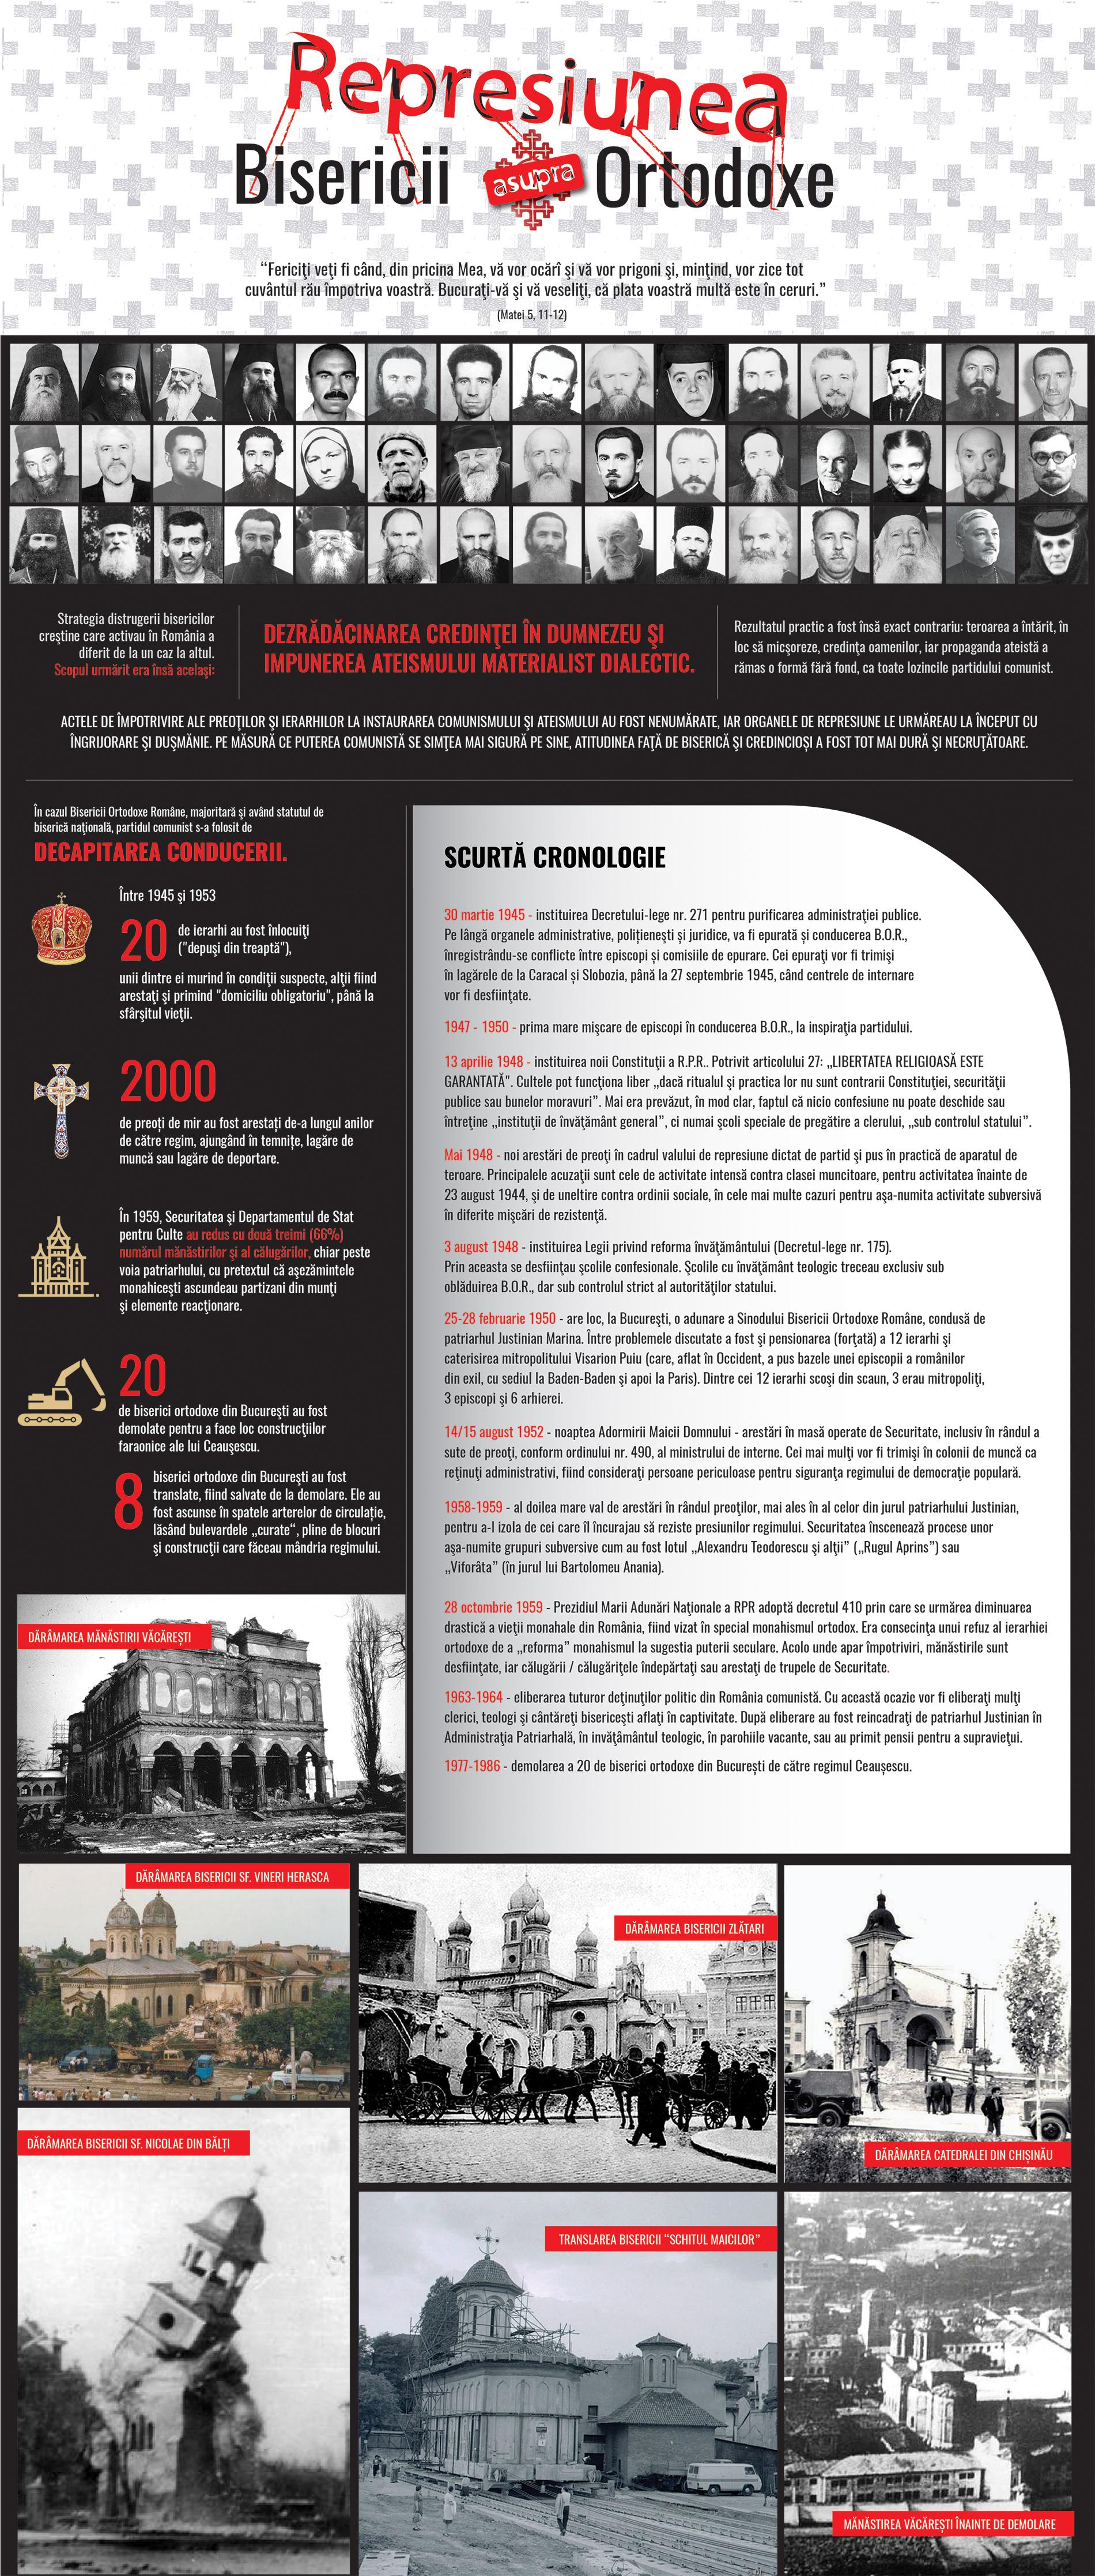 Represiunea asupra Bisericii Ortodoxe Române - Bannerul 12 - Caravana Eroilor